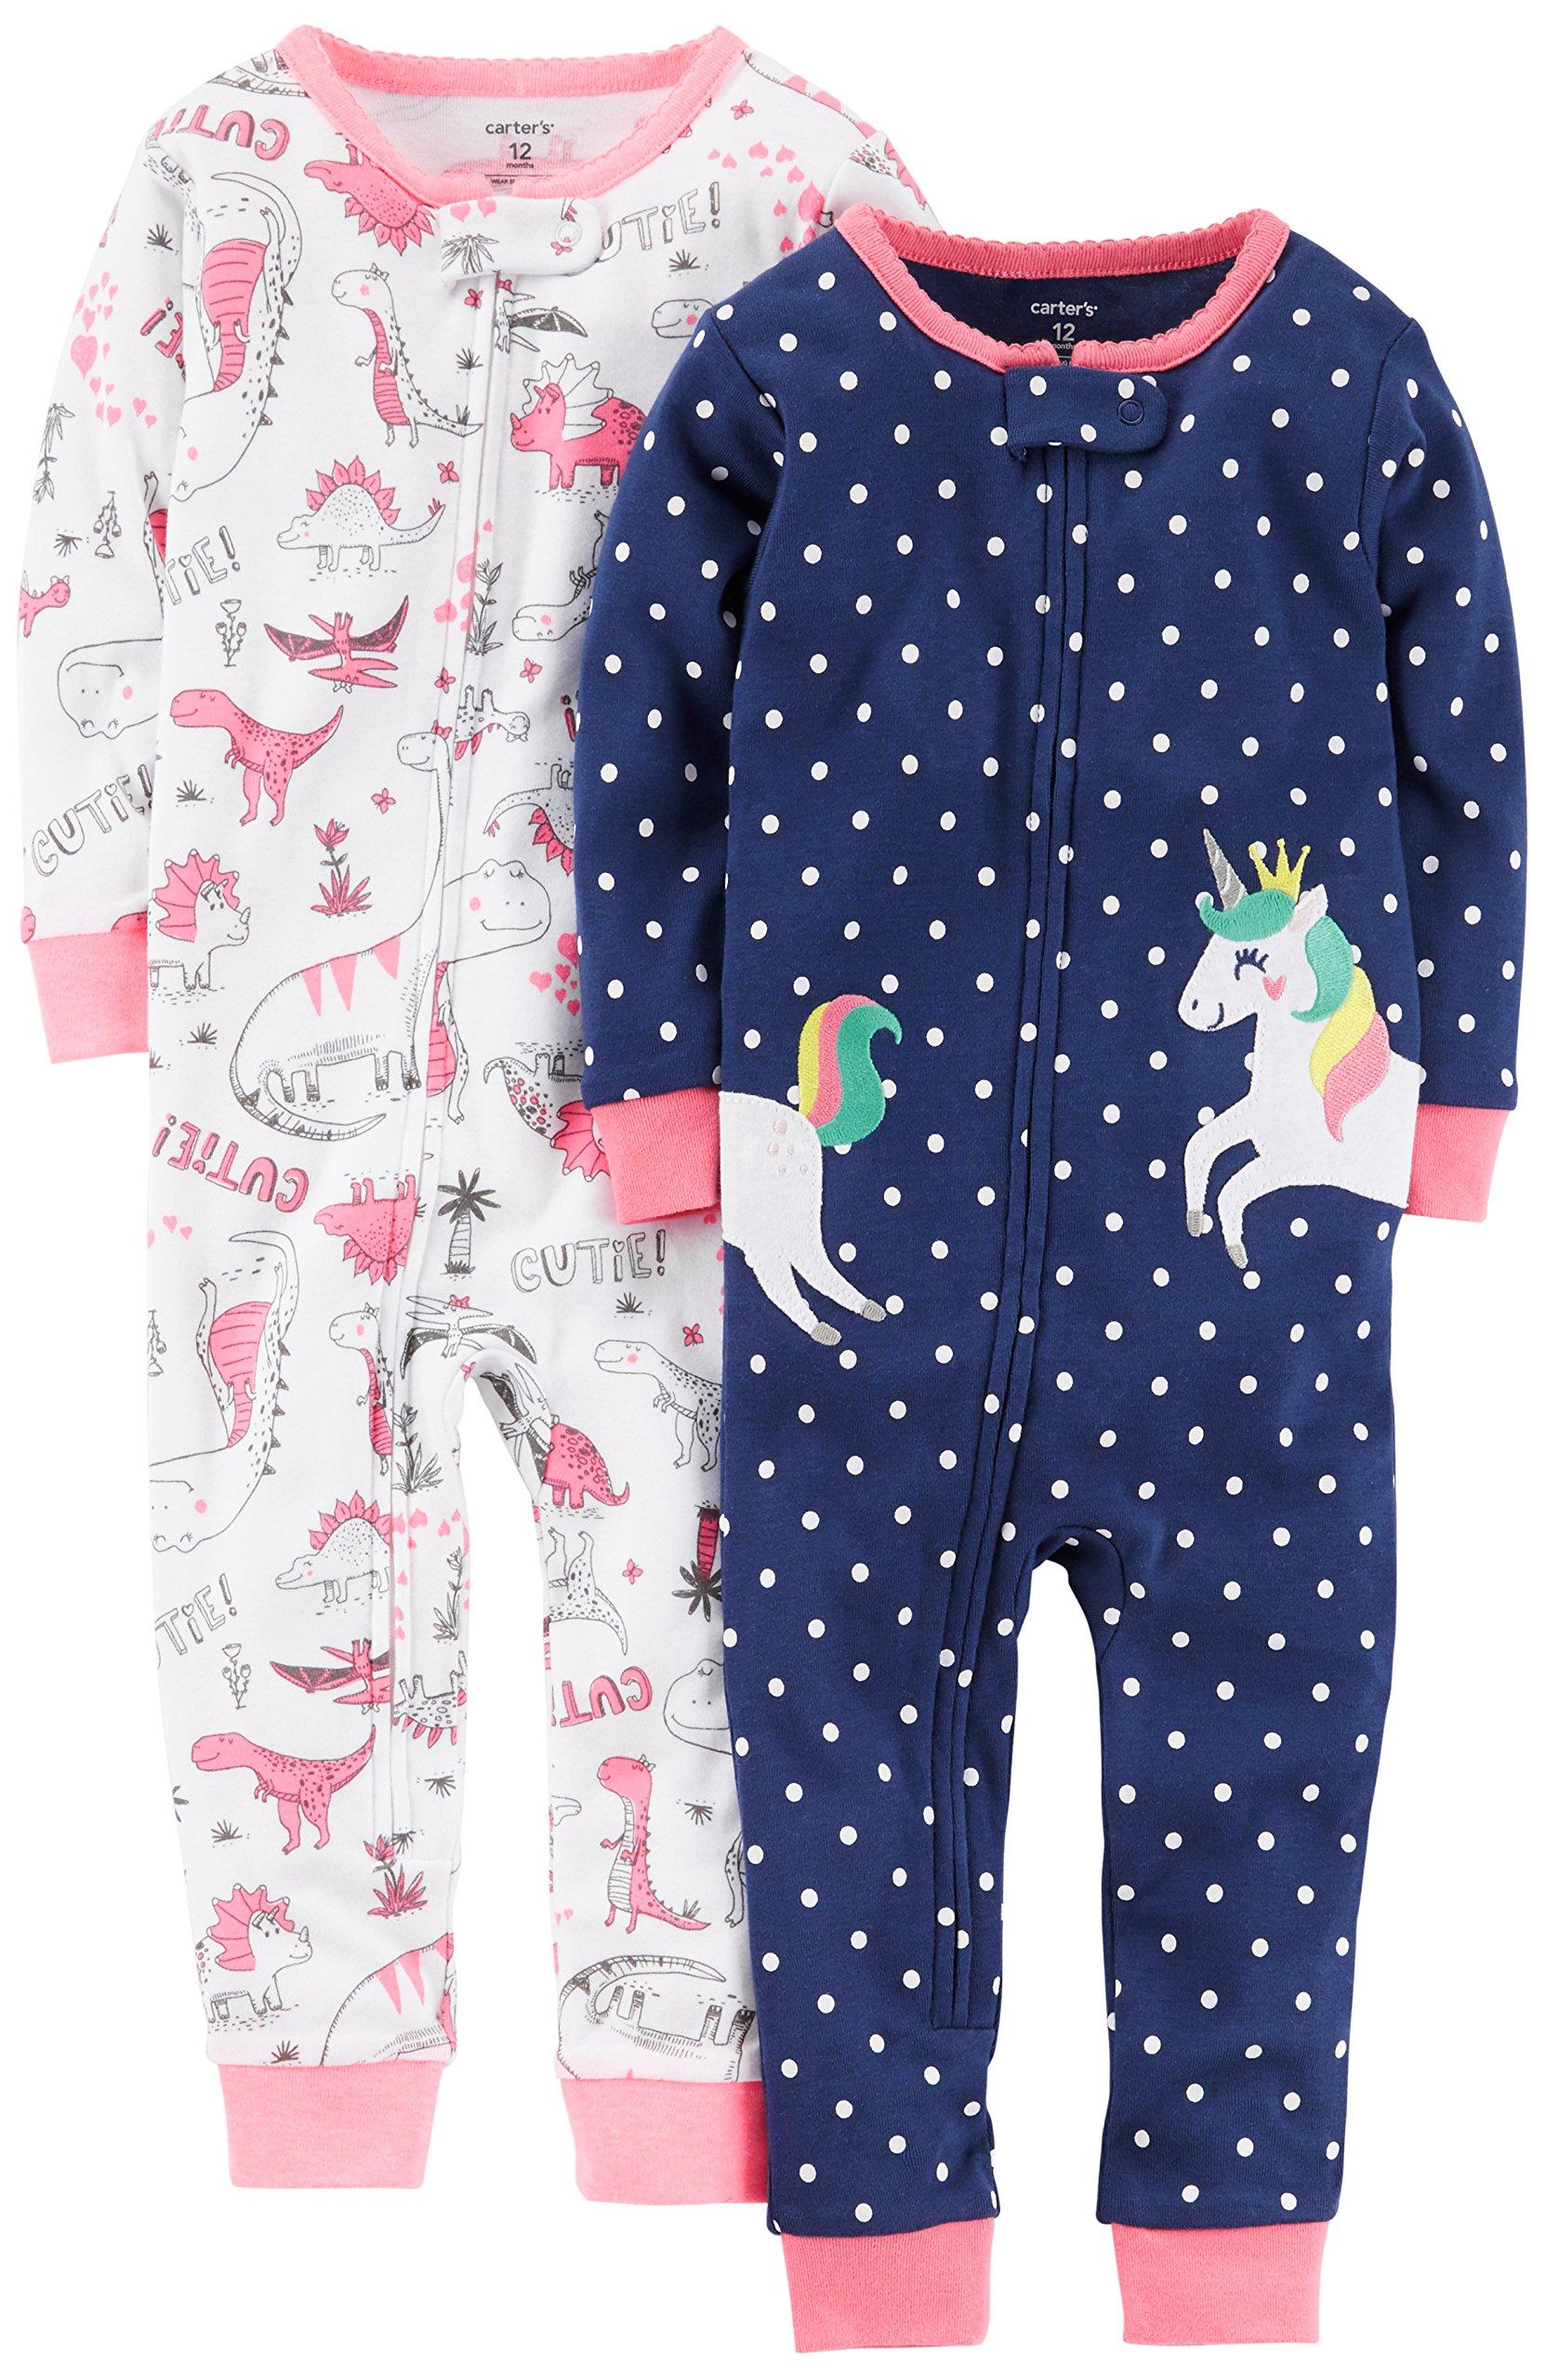 Carter's Baby Girls' 2-Pack Cotton Footless Pajamas, Unicorn/Dino, 18 Months